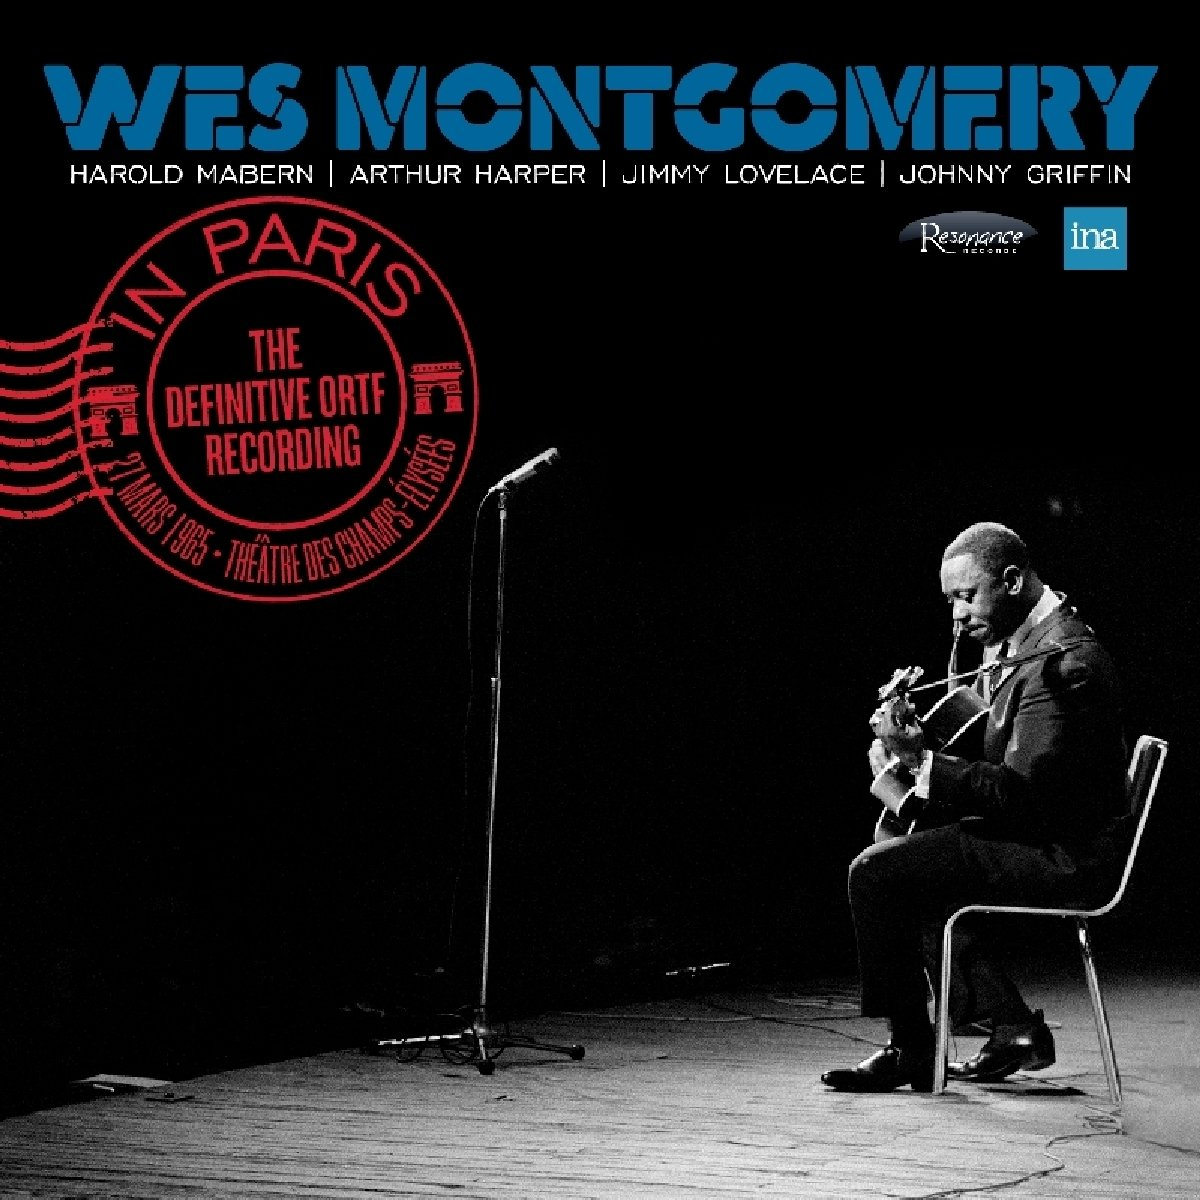 In Paris: The Definitive ORTF Recording [2 CD]